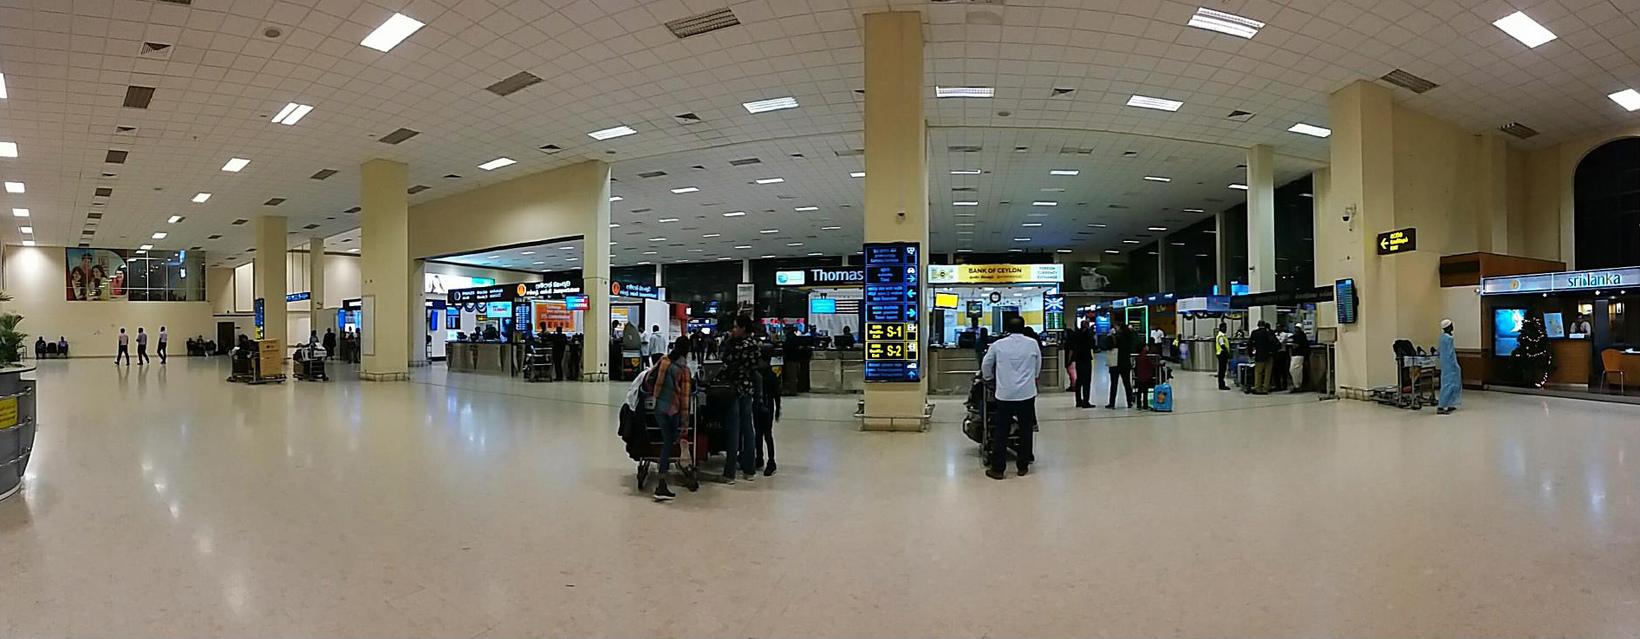 Bandaranaike International Airport (CMB)